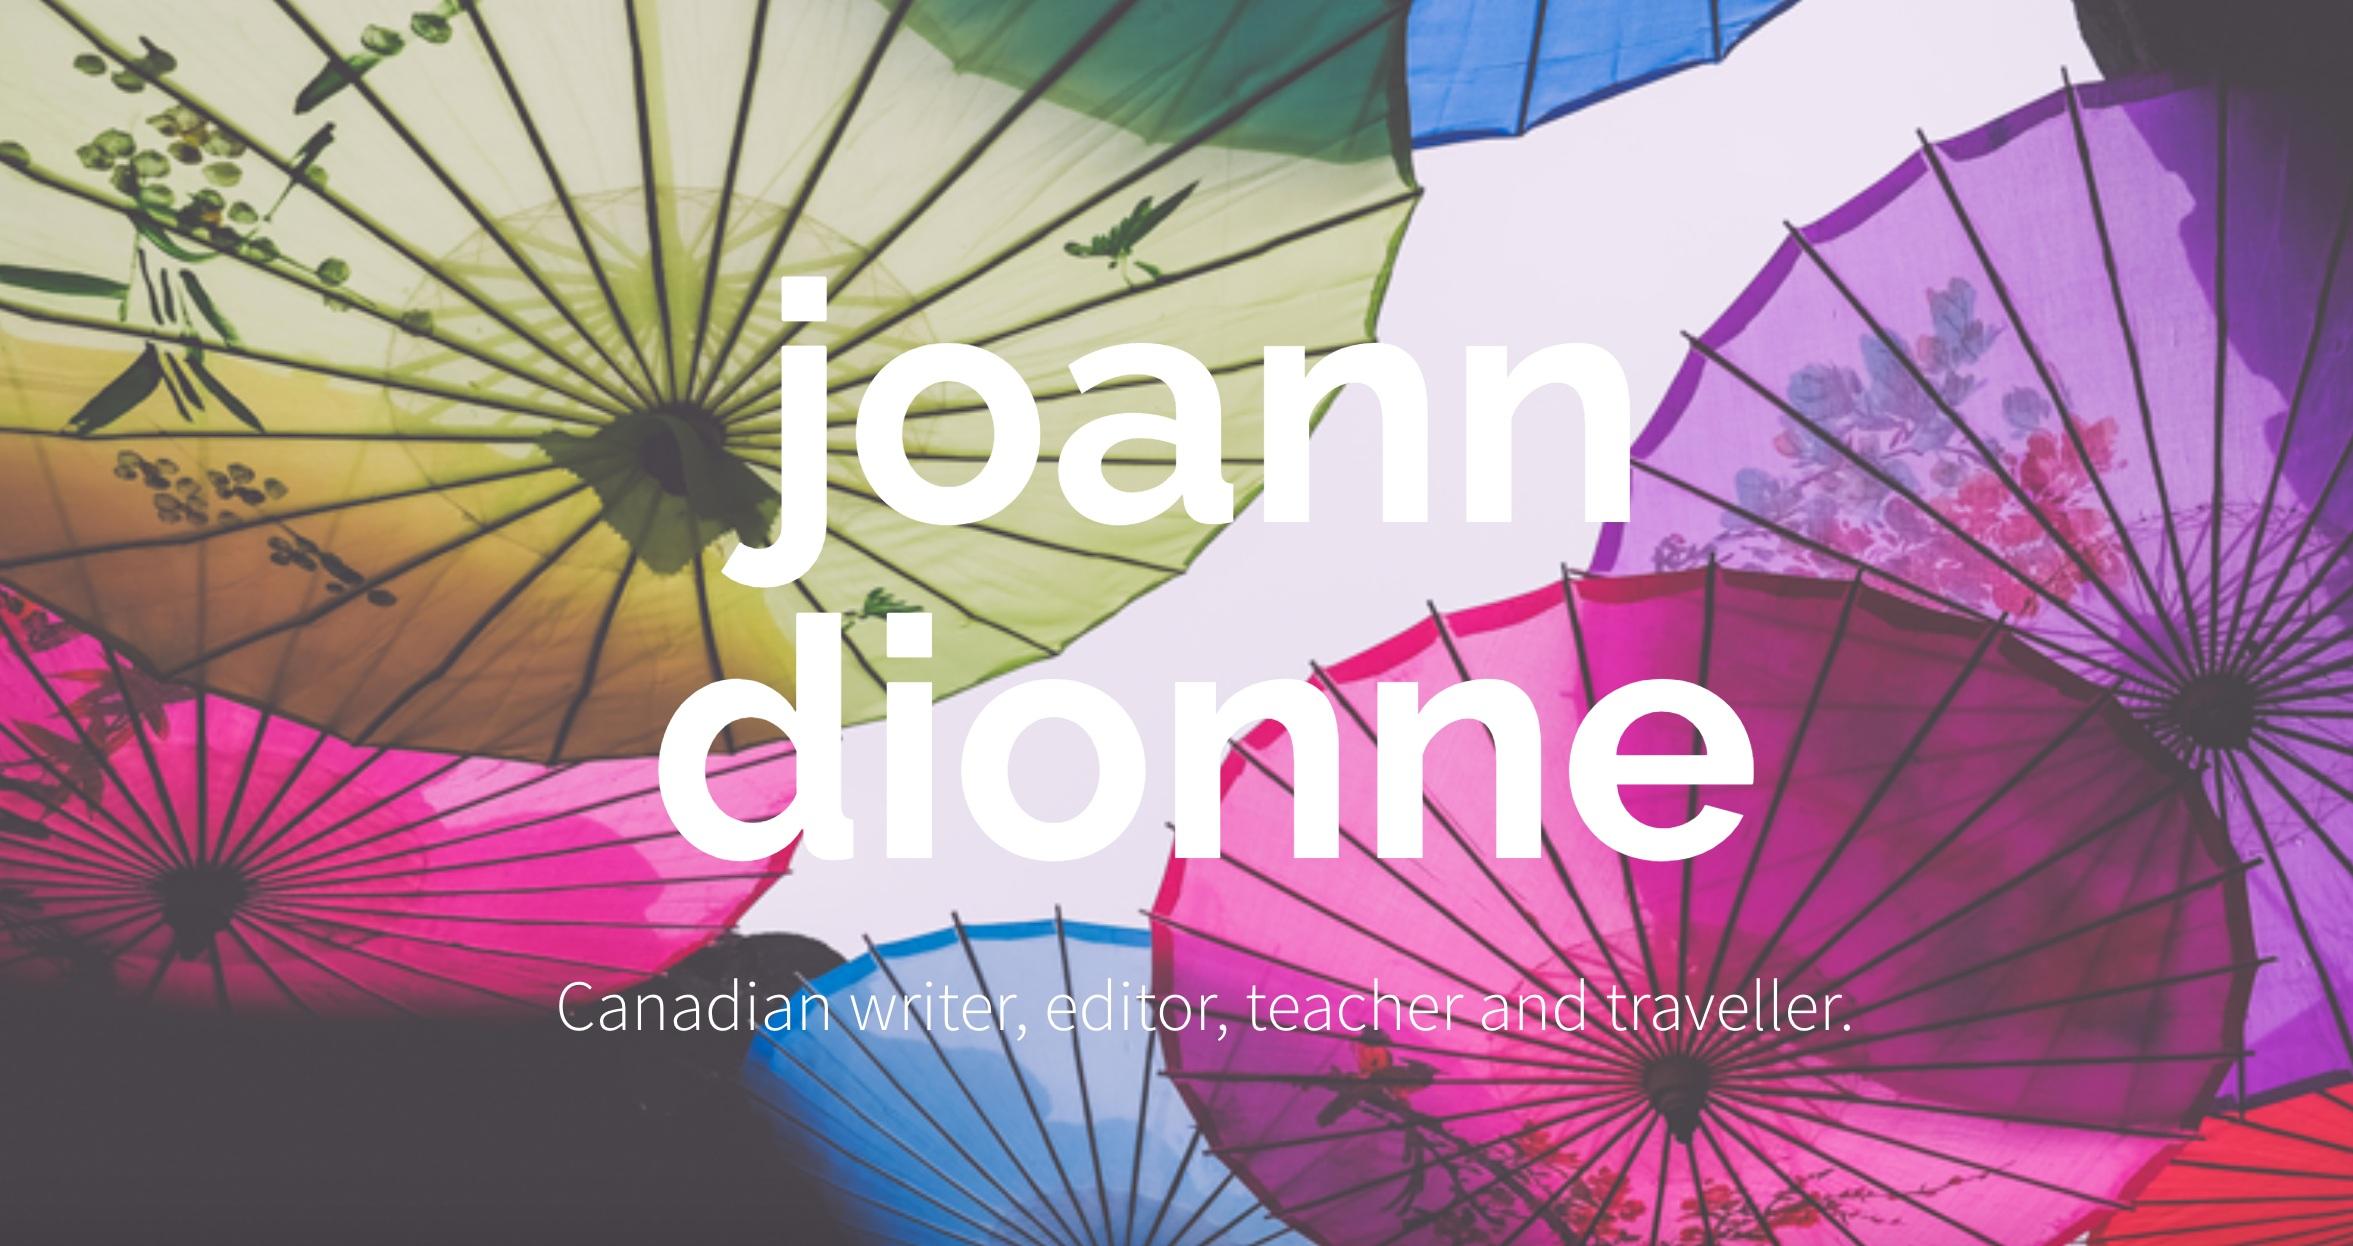 Website design for Canadian author, JoAnn Dionne